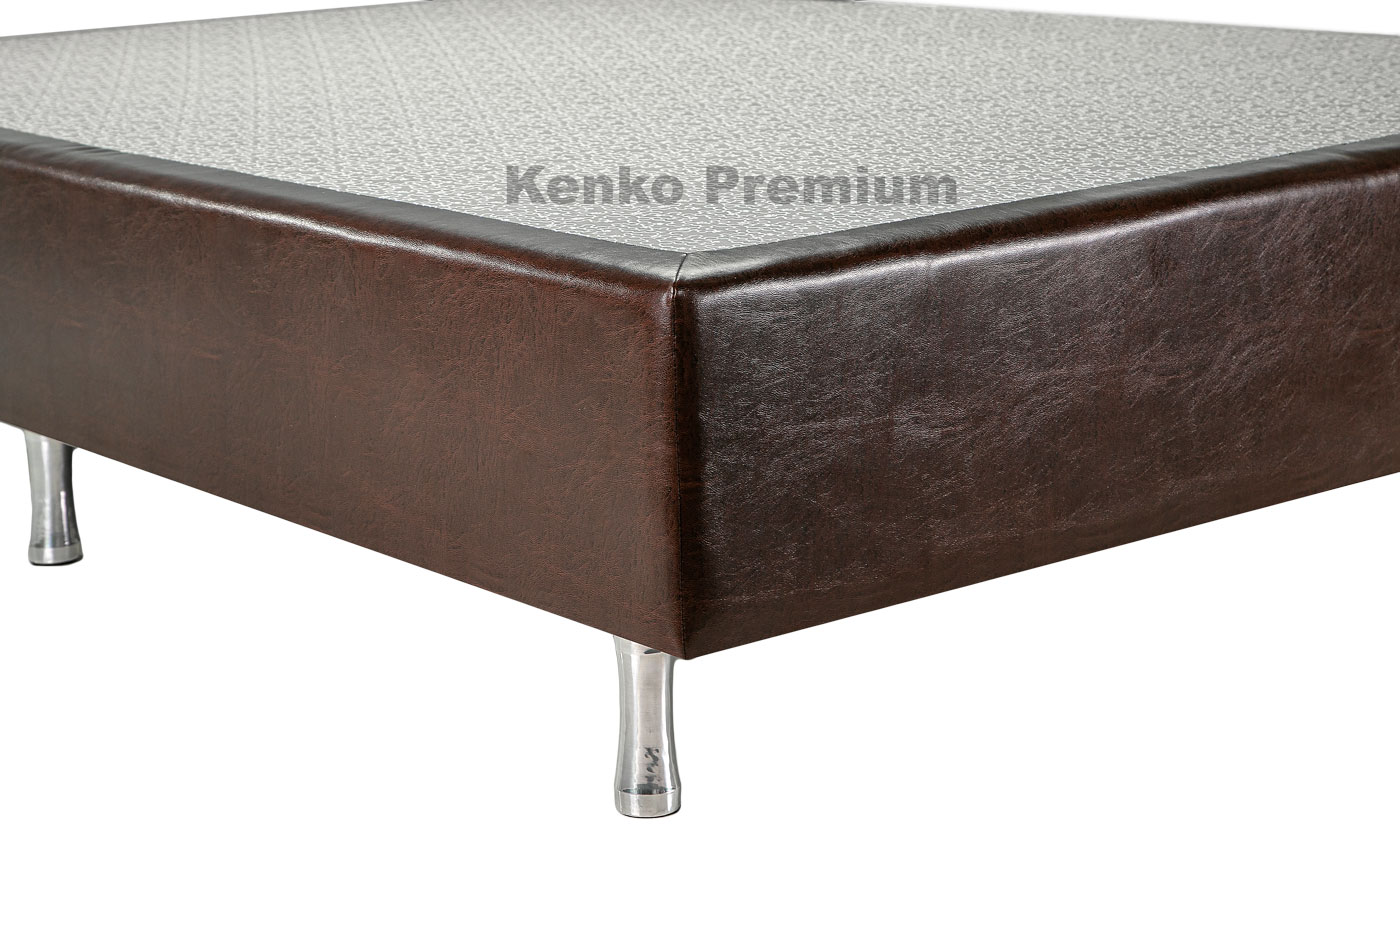 Box Base Para Colchão Casal CORINO 1,38x1,88 Kenko Premium   - Kenko Premium Colchões